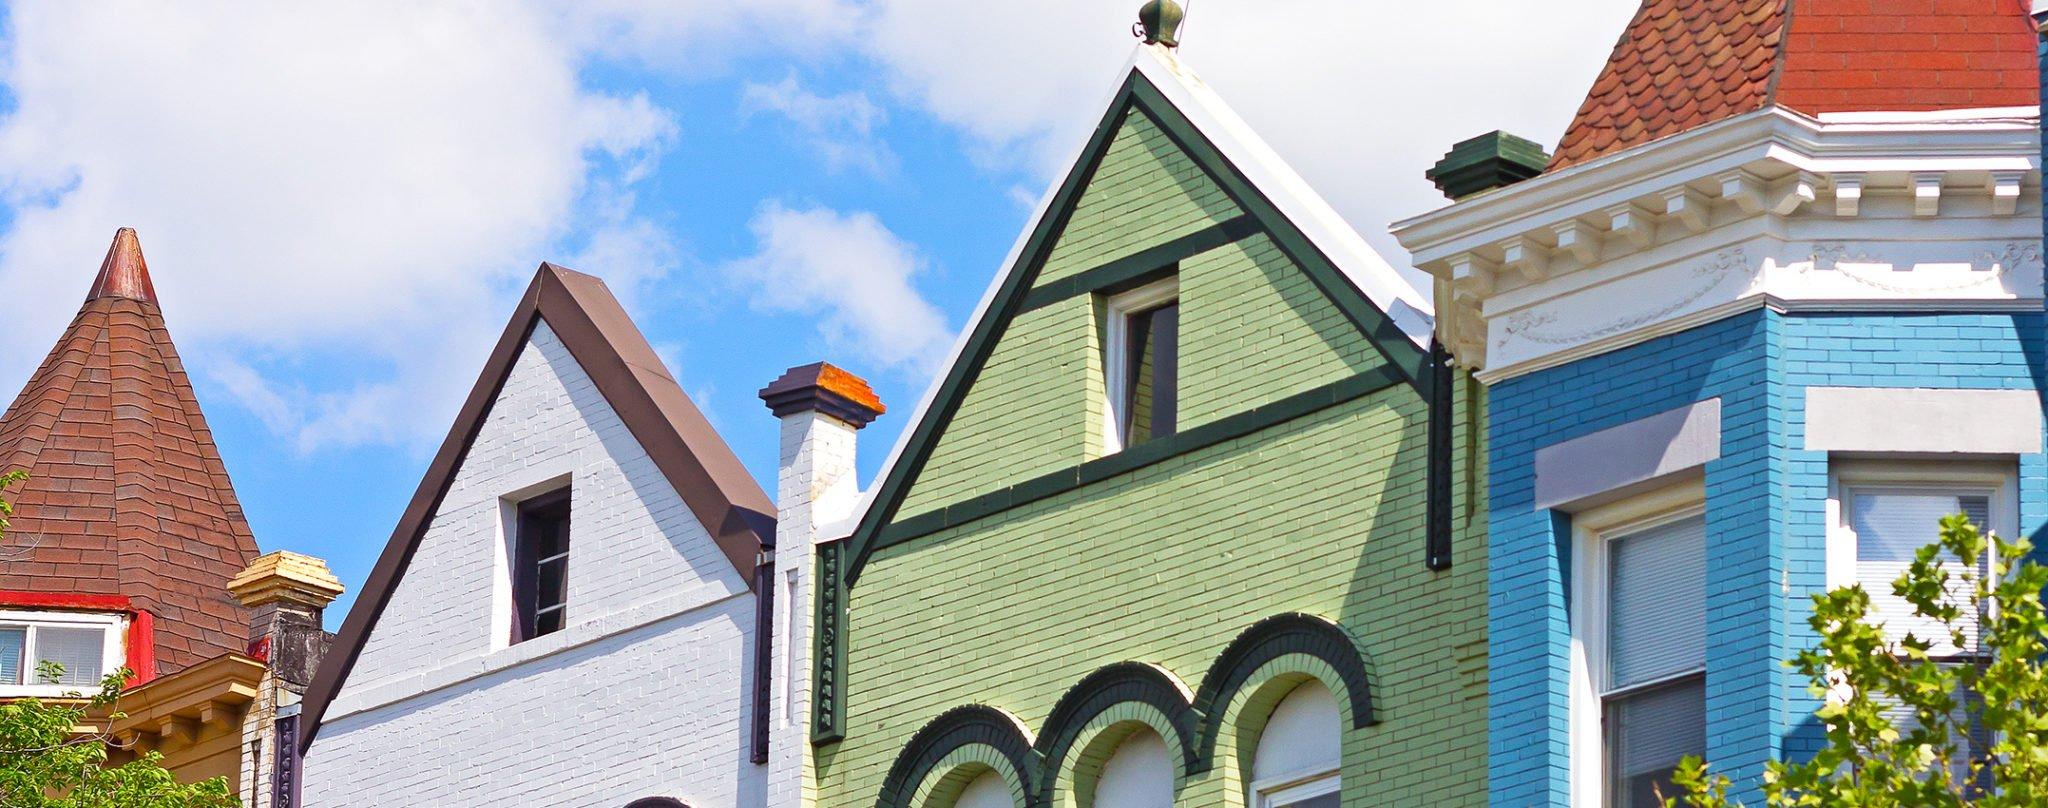 DC Neighborhood Guide: DC Rowhouses. Photograph via iStock.